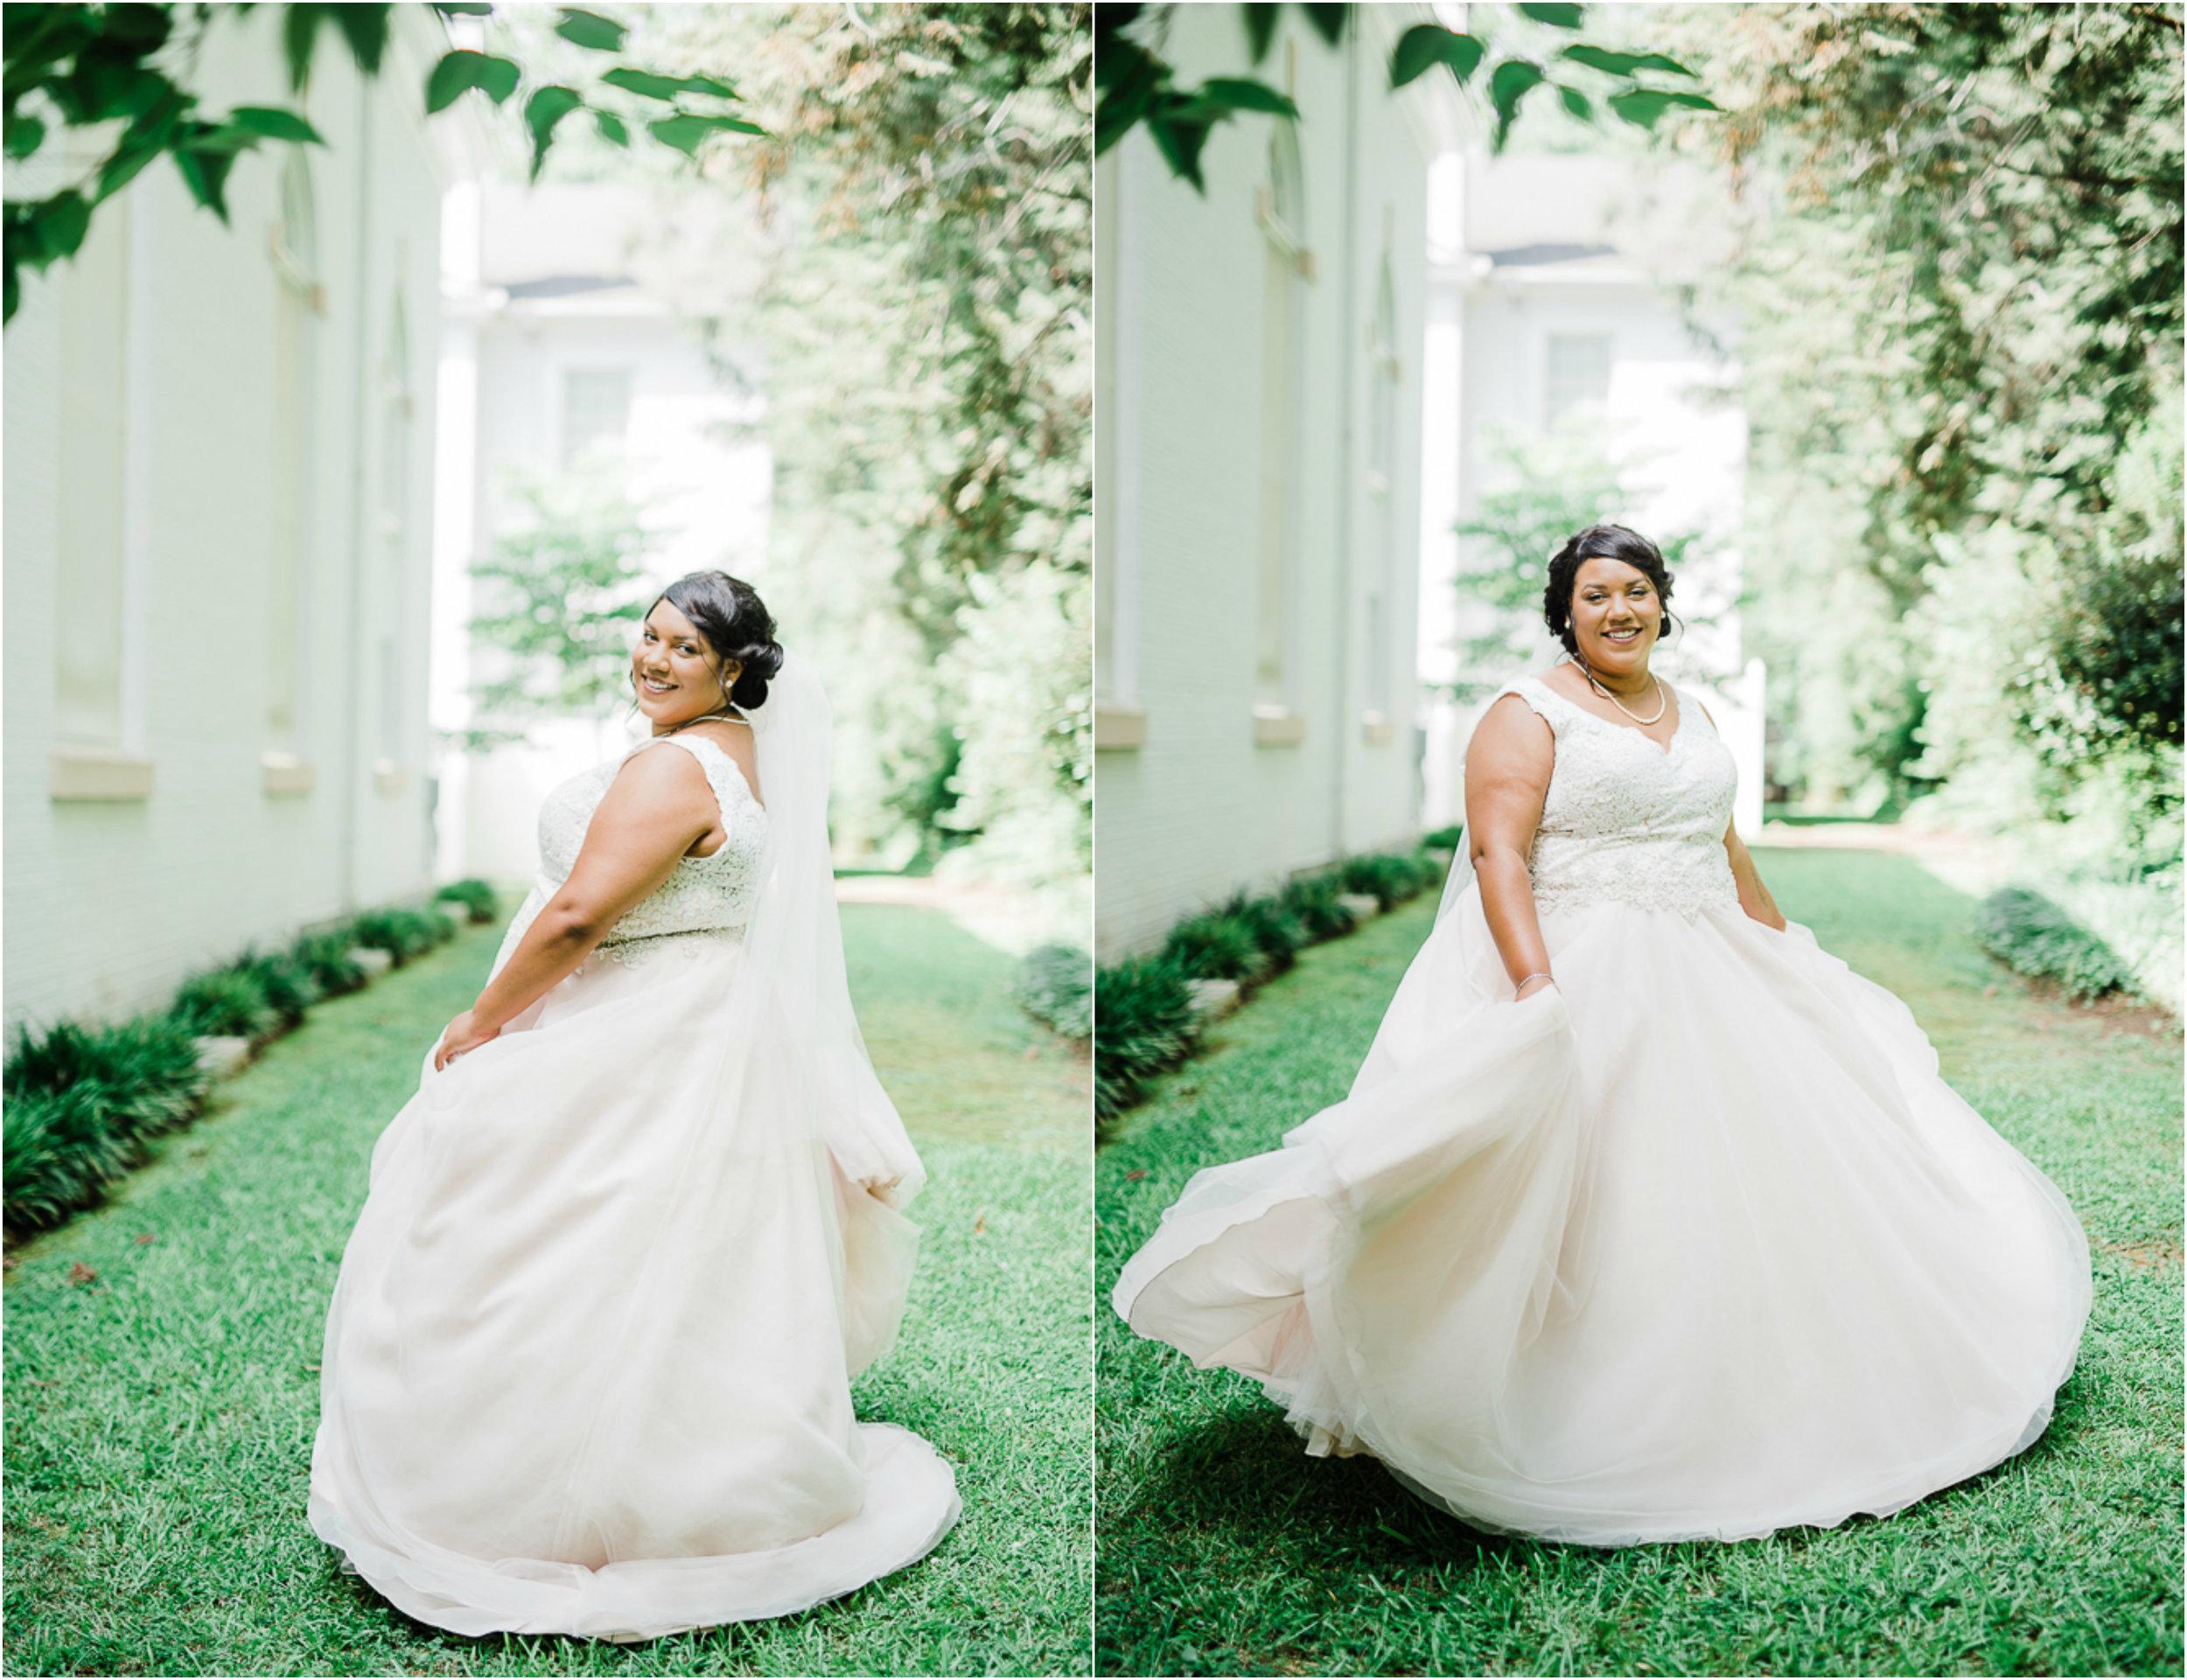 Blush Wedding Dress, Bride, Summer Wedding, 0005.jpg